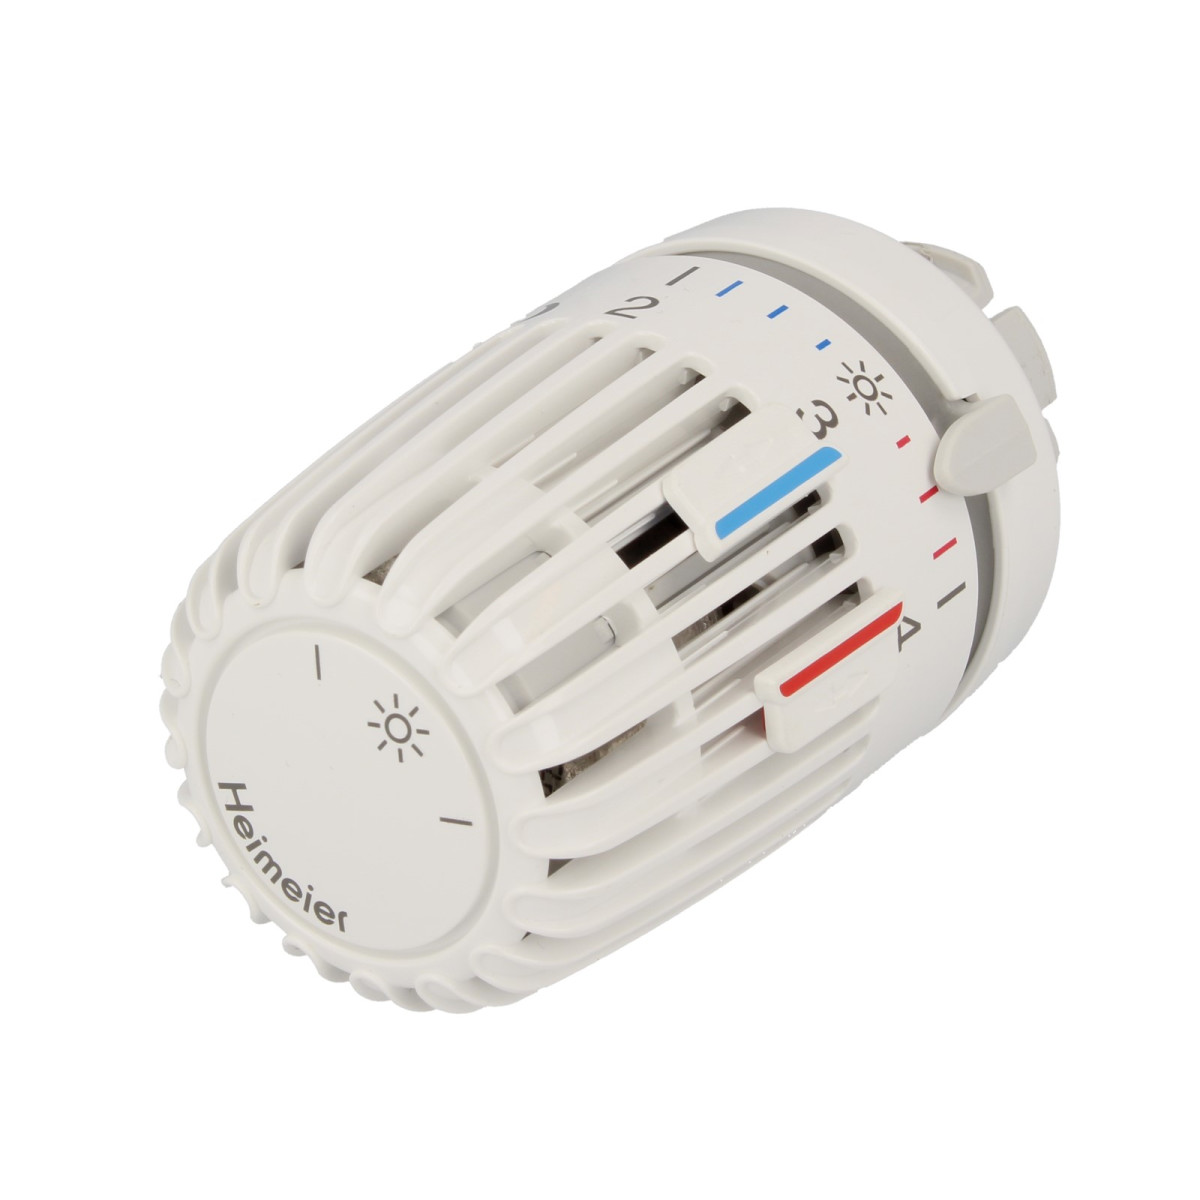 Heimeier Thermostatkopf Vk Mit Direktanschluss Fur Danfoss Herz Ta 14 84